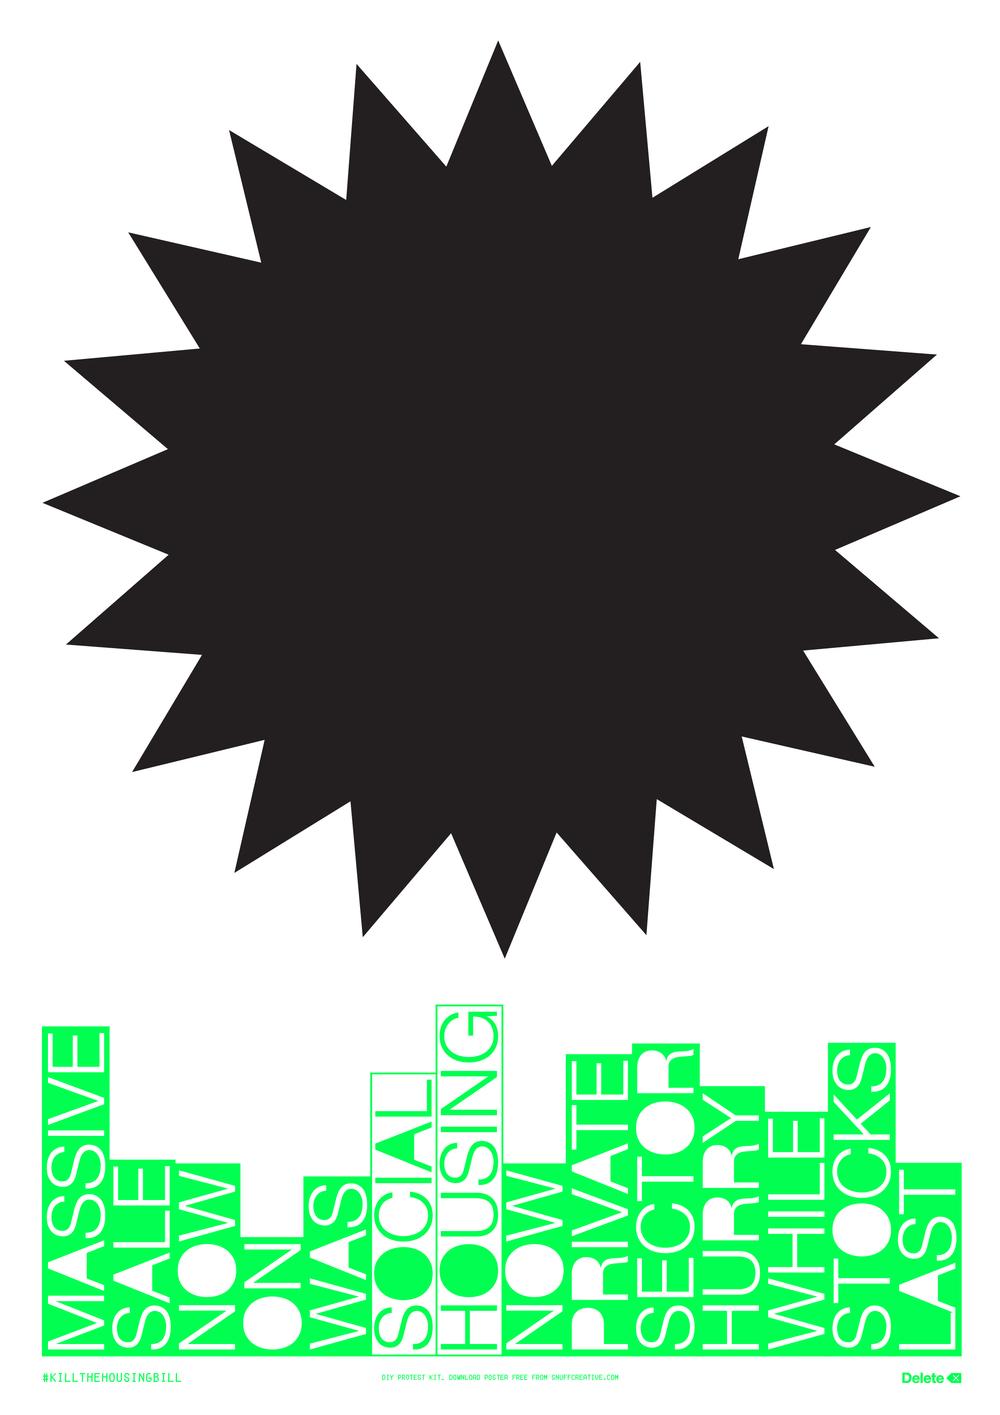 MASSIVE SALE TYPE POSTER_BLACK1-04.jpg